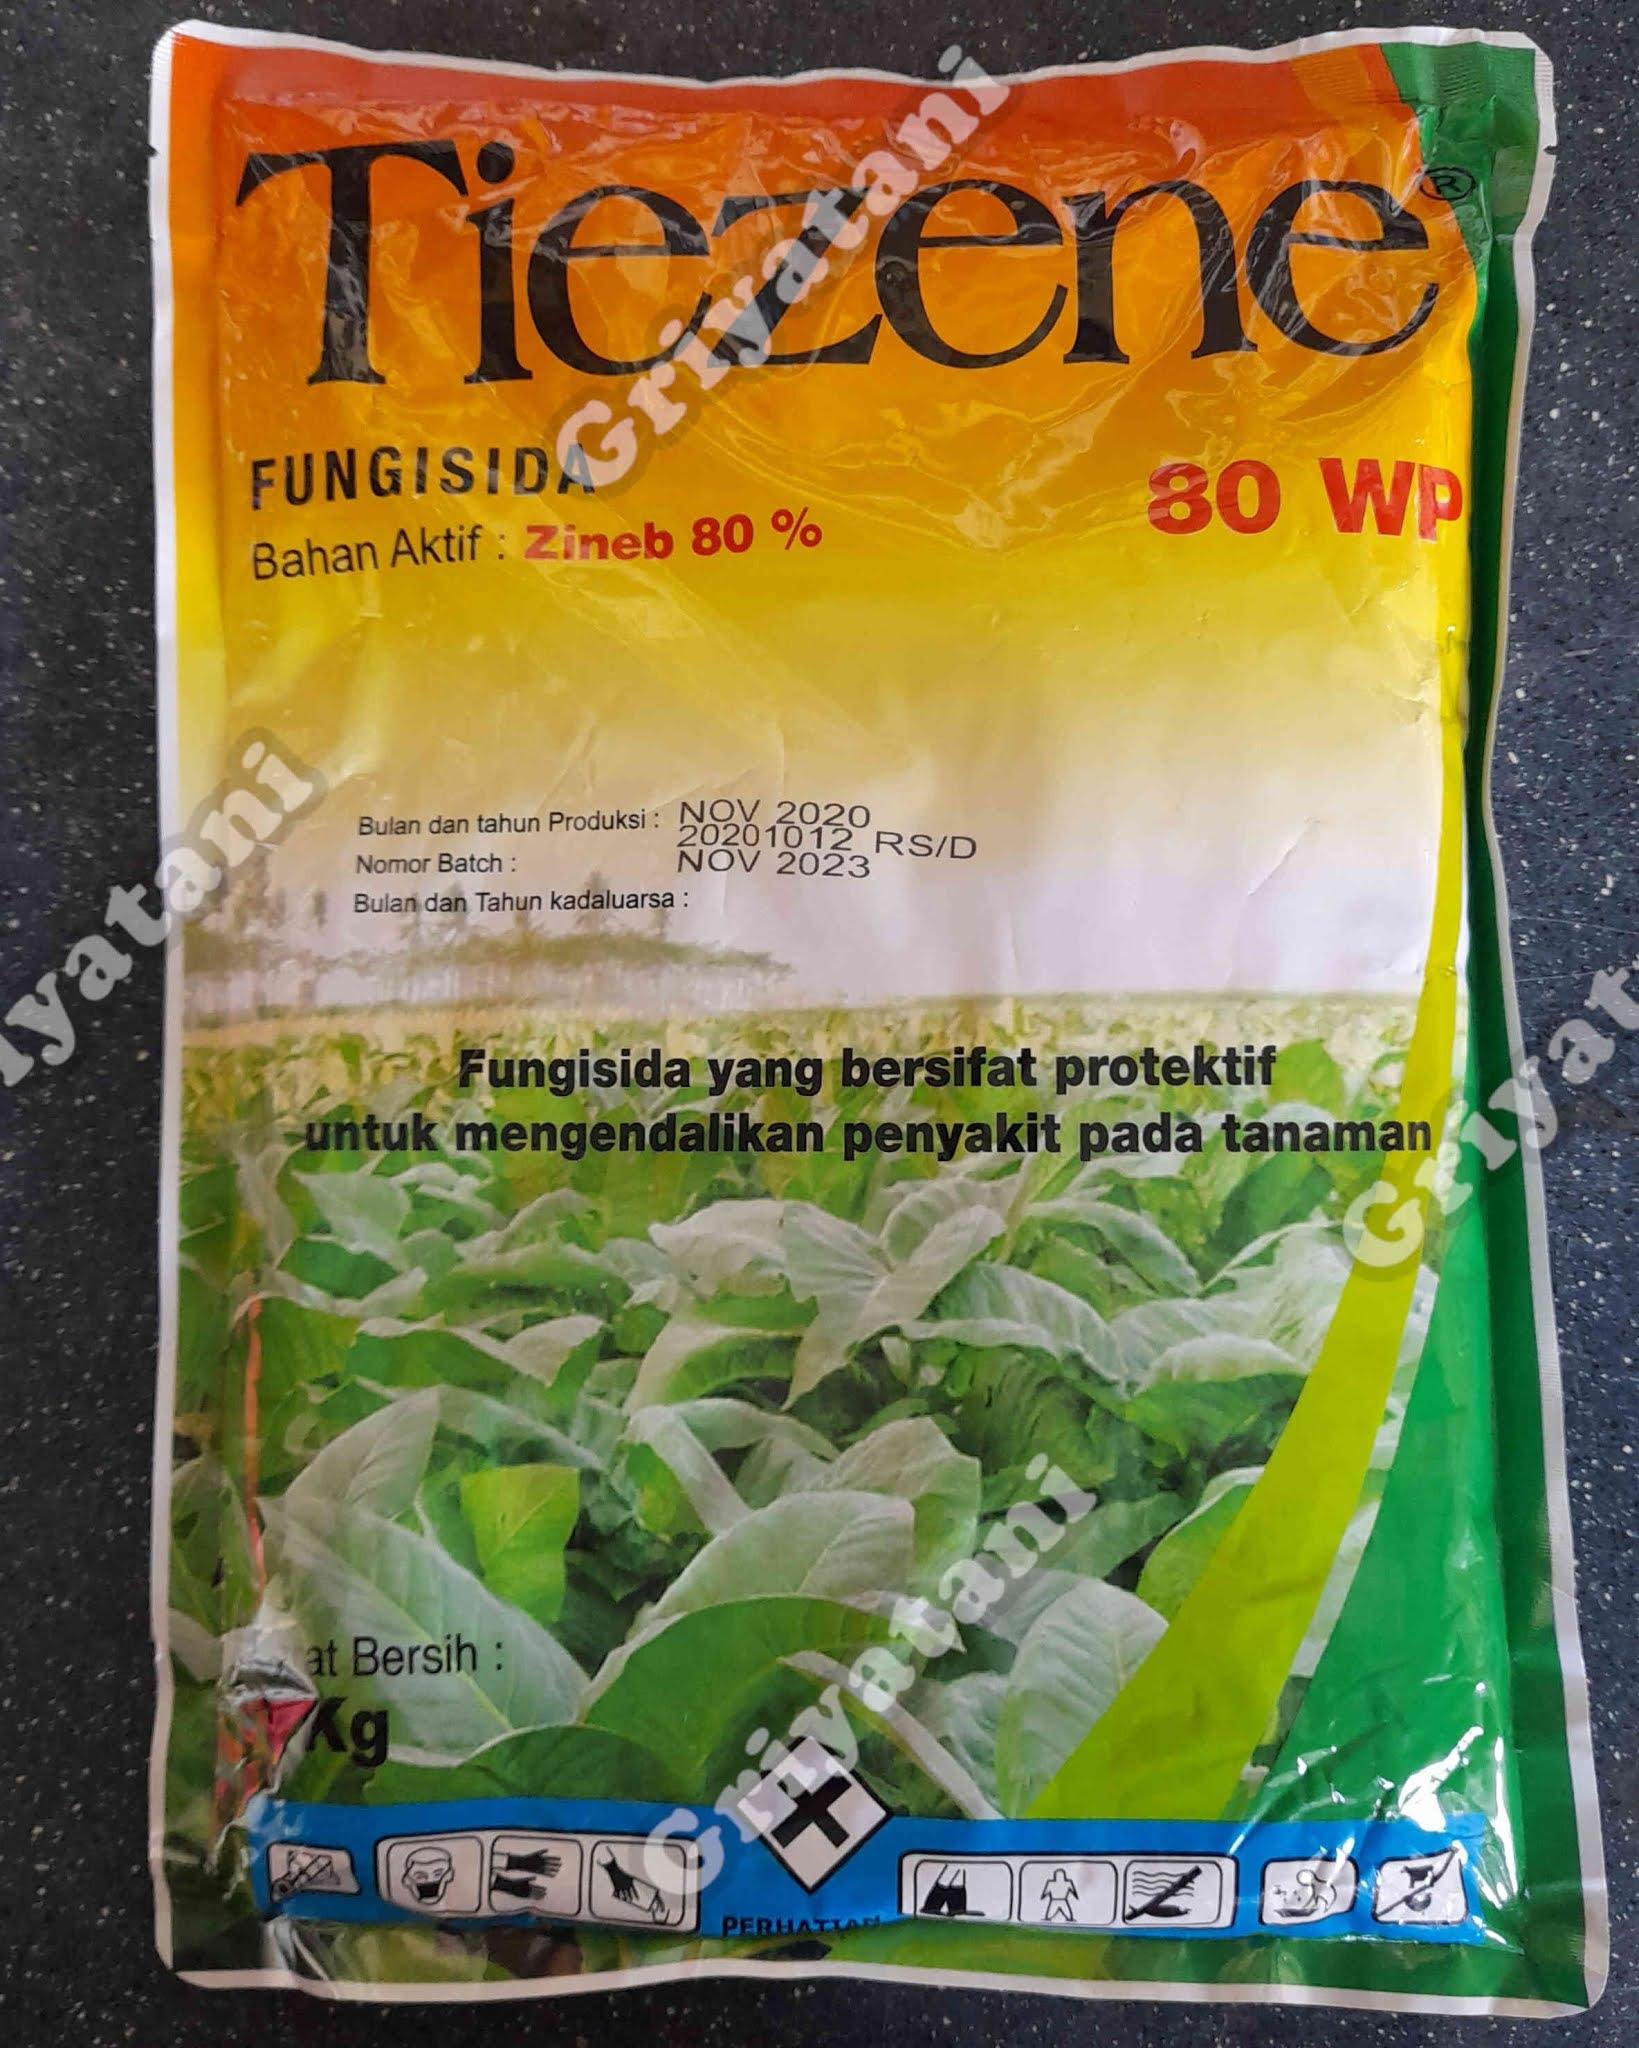 Fungisida Tiezene